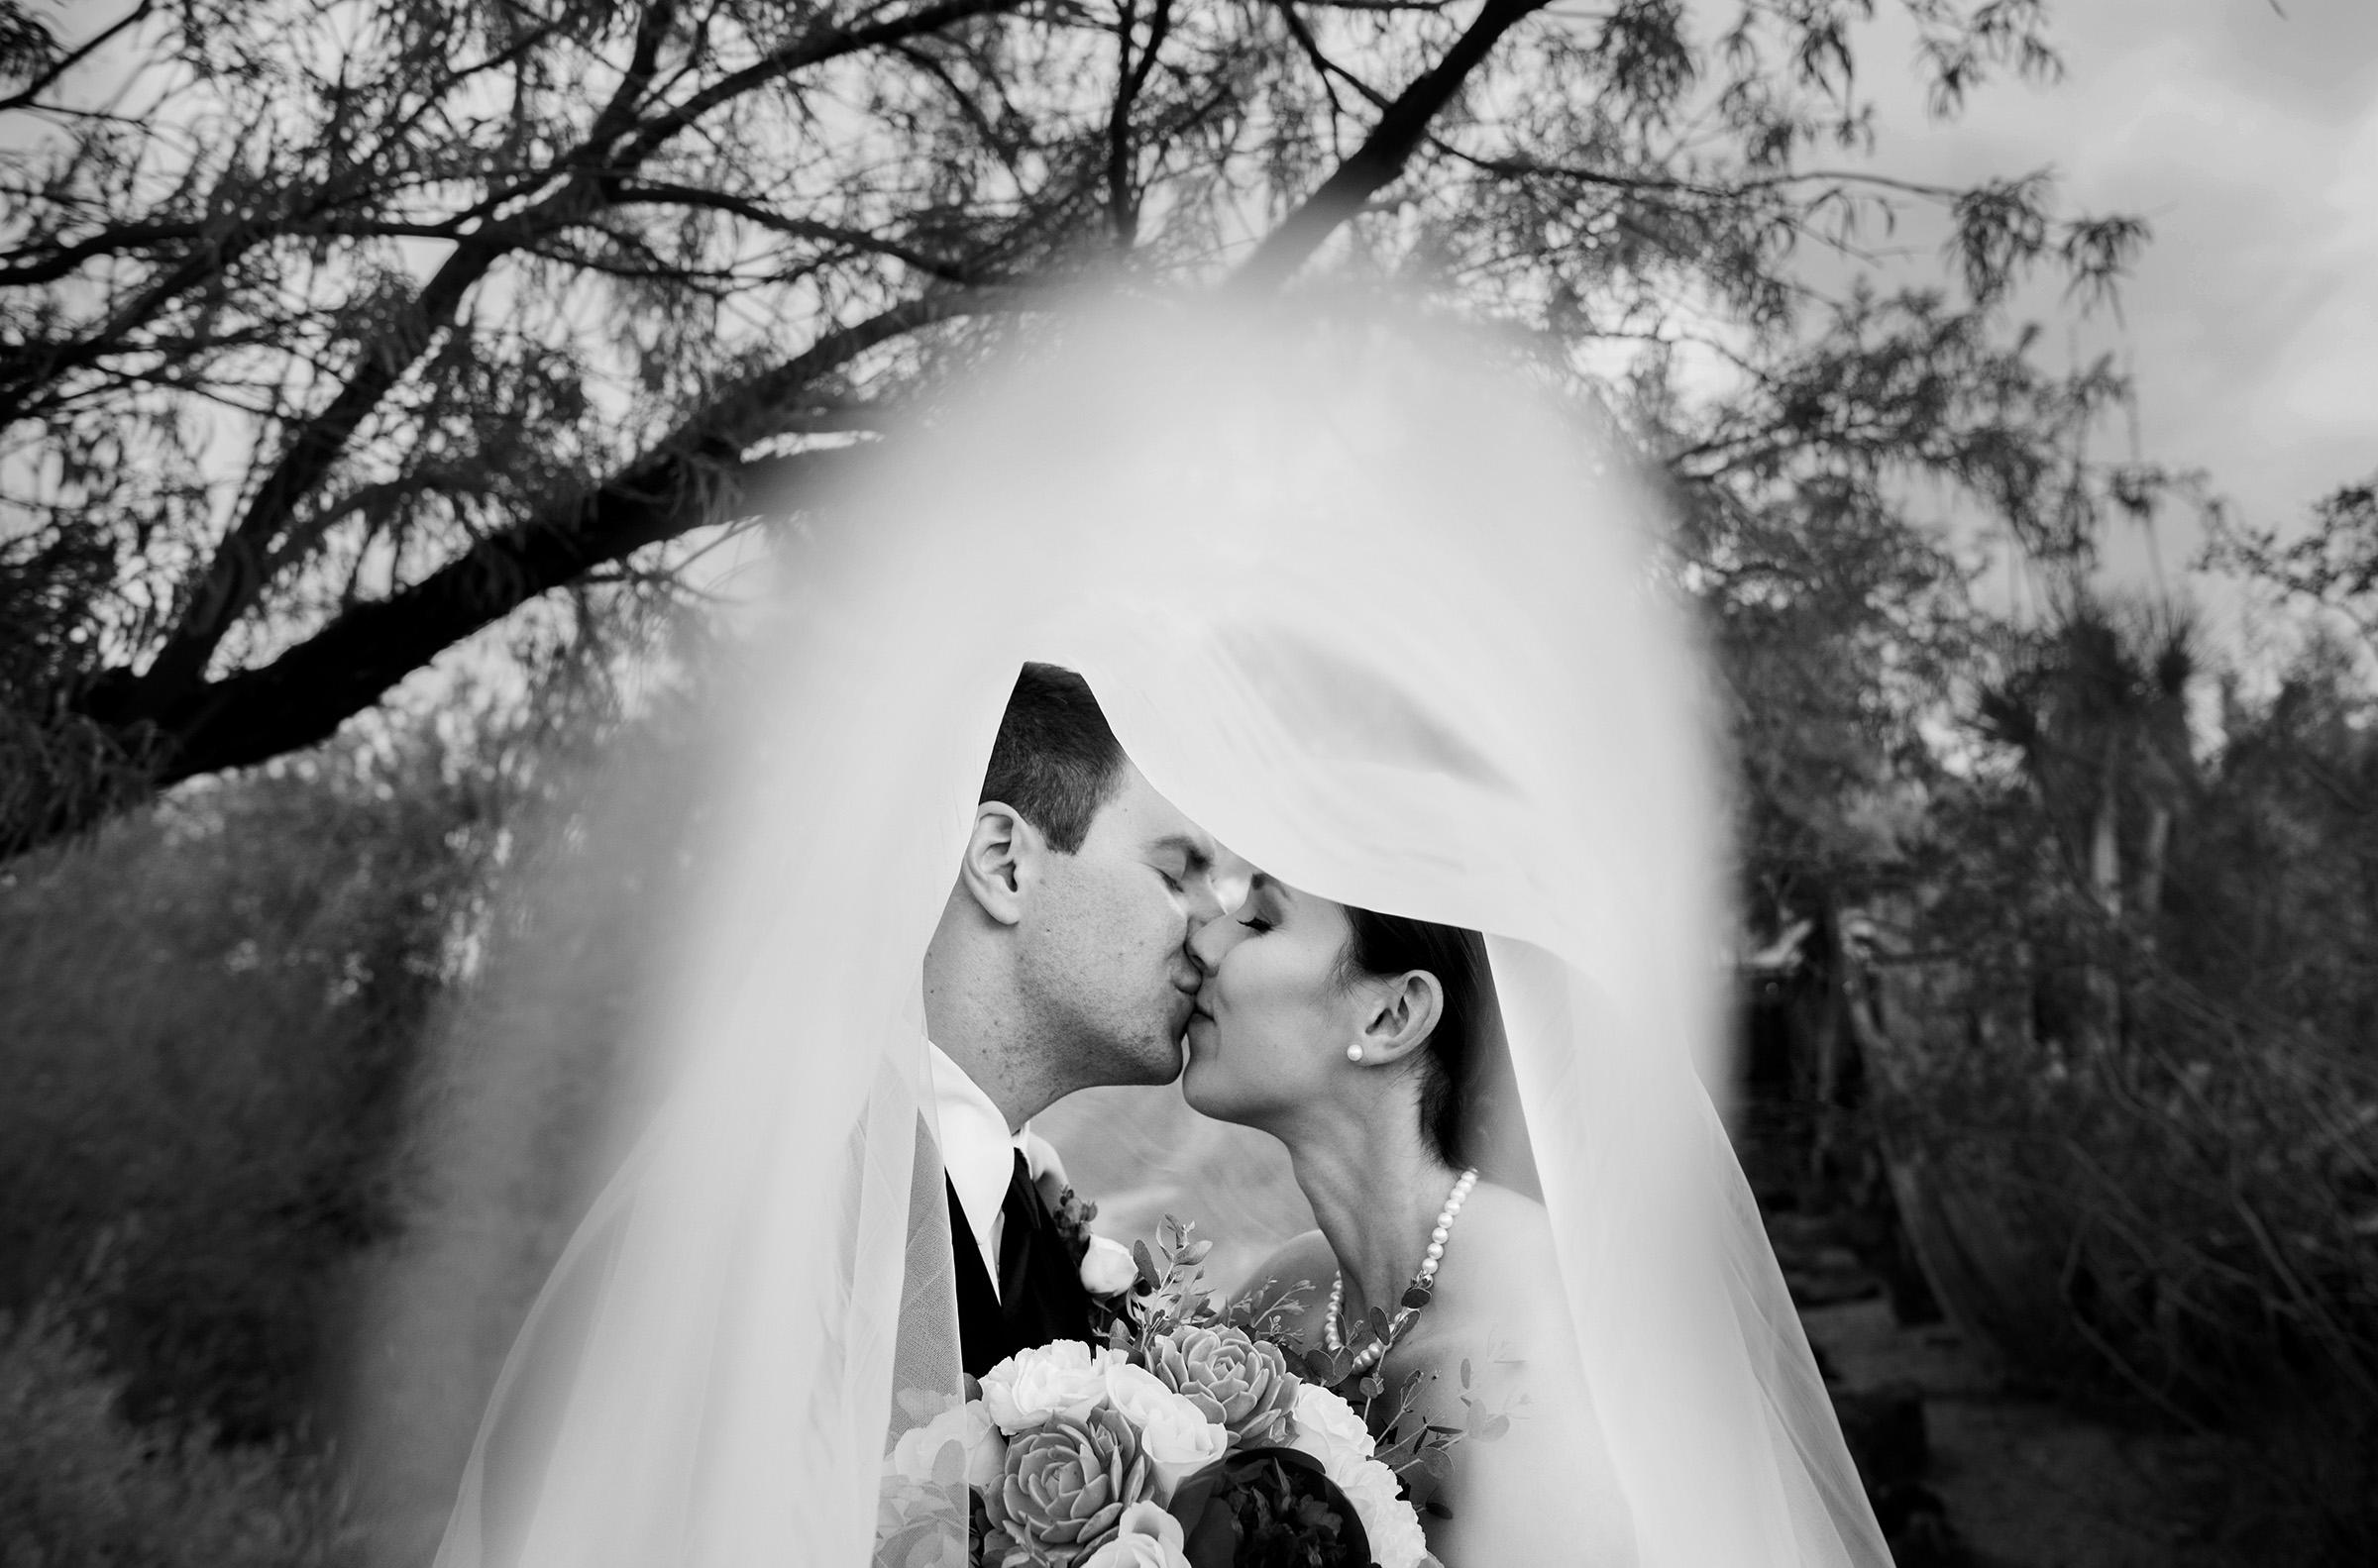 under the bridal veil